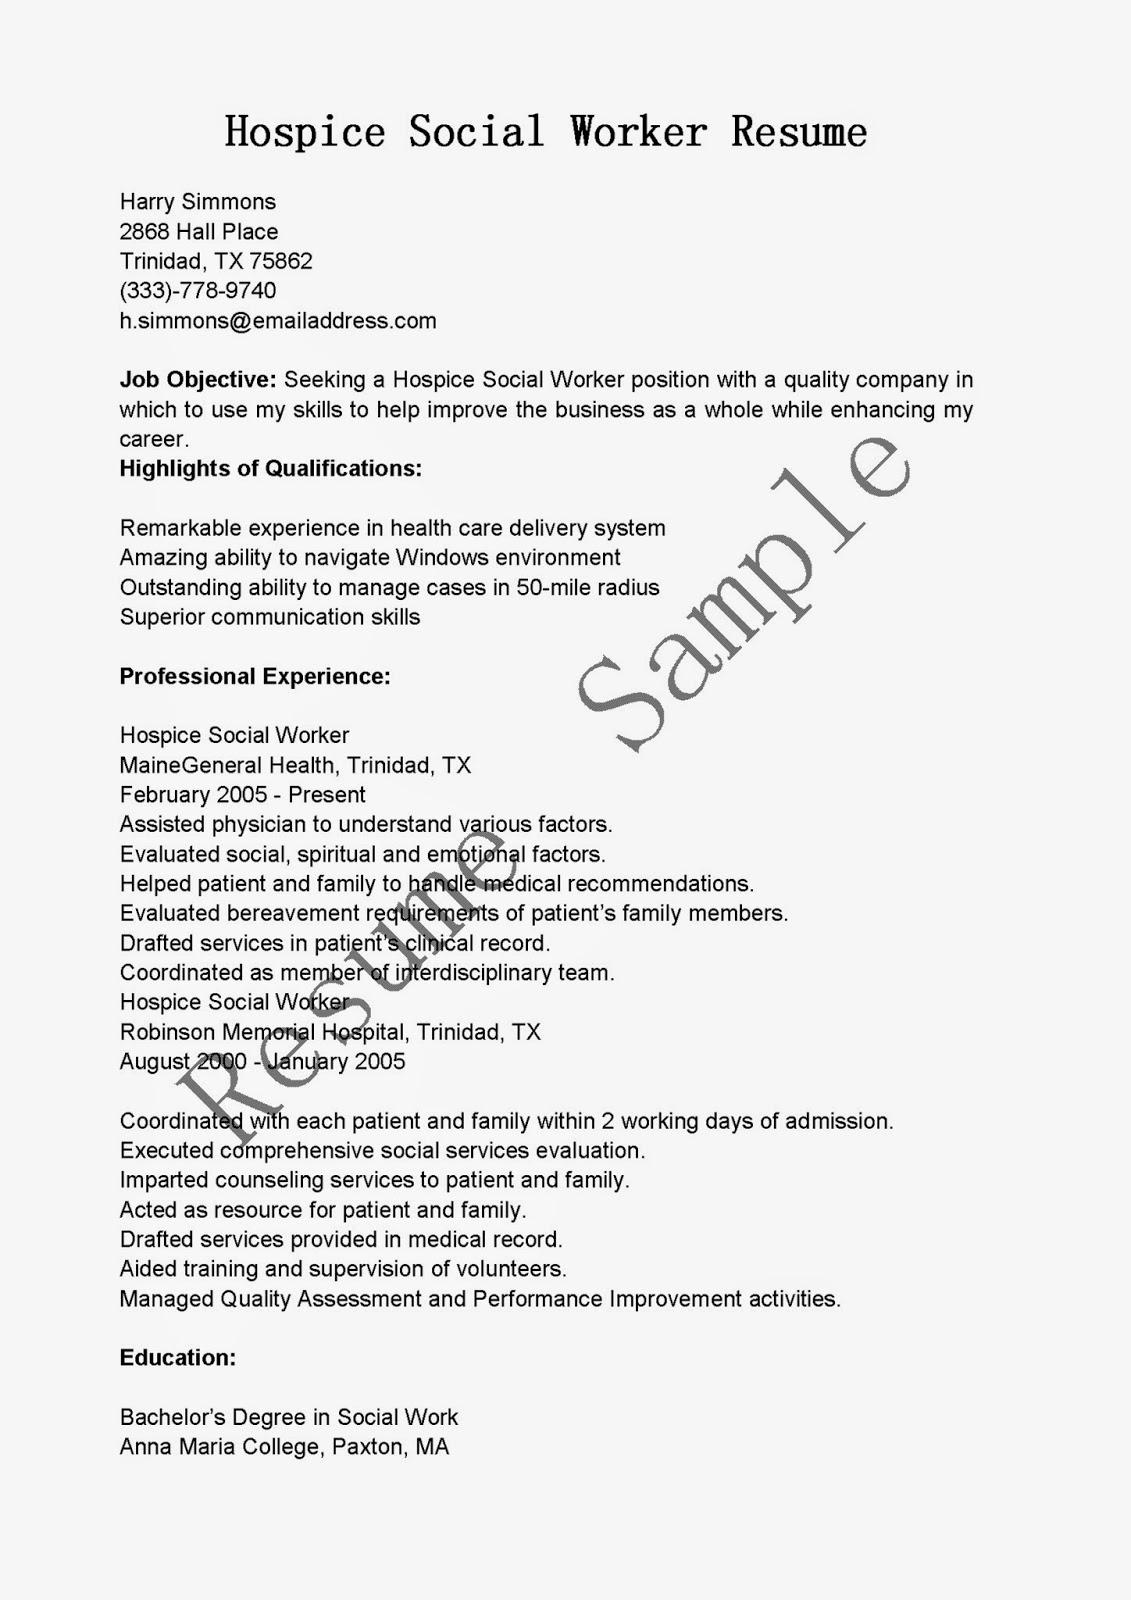 School Administrator Resume Vosvetenet – Sample Resume for School Administrator